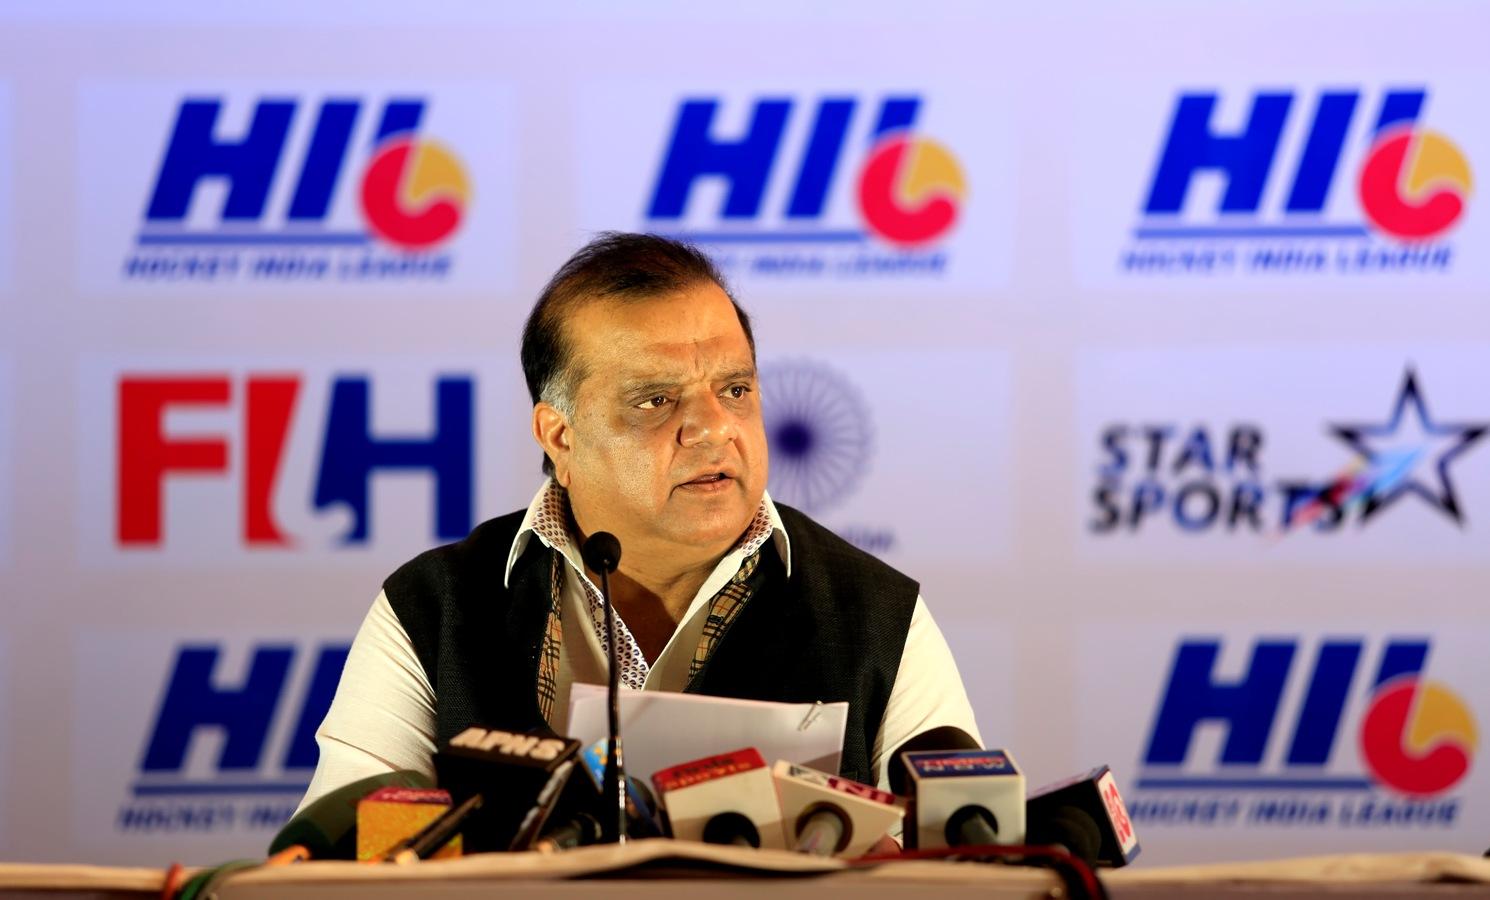 Dr.-Narinder-Dhruv-Batra-Hockey-India-President-and-Hockey-India-League-Chairman2